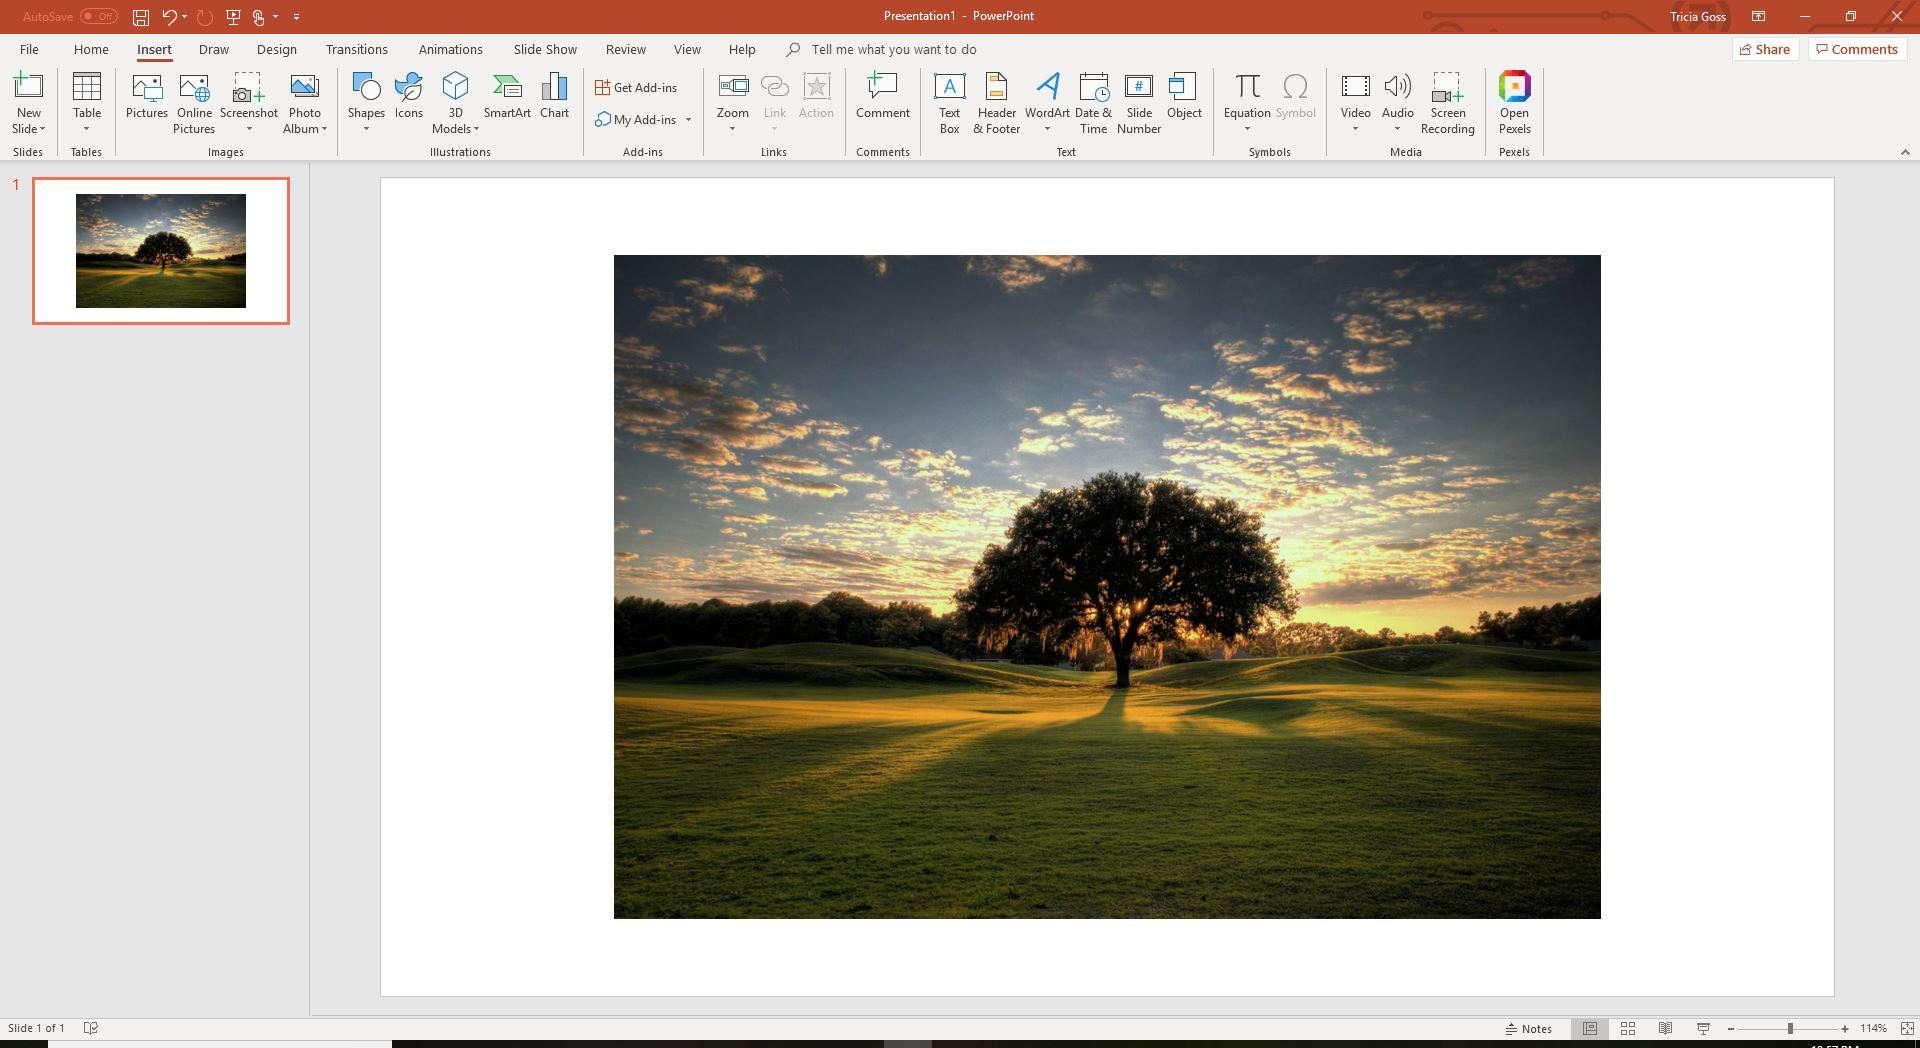 Insert image PowerPoint